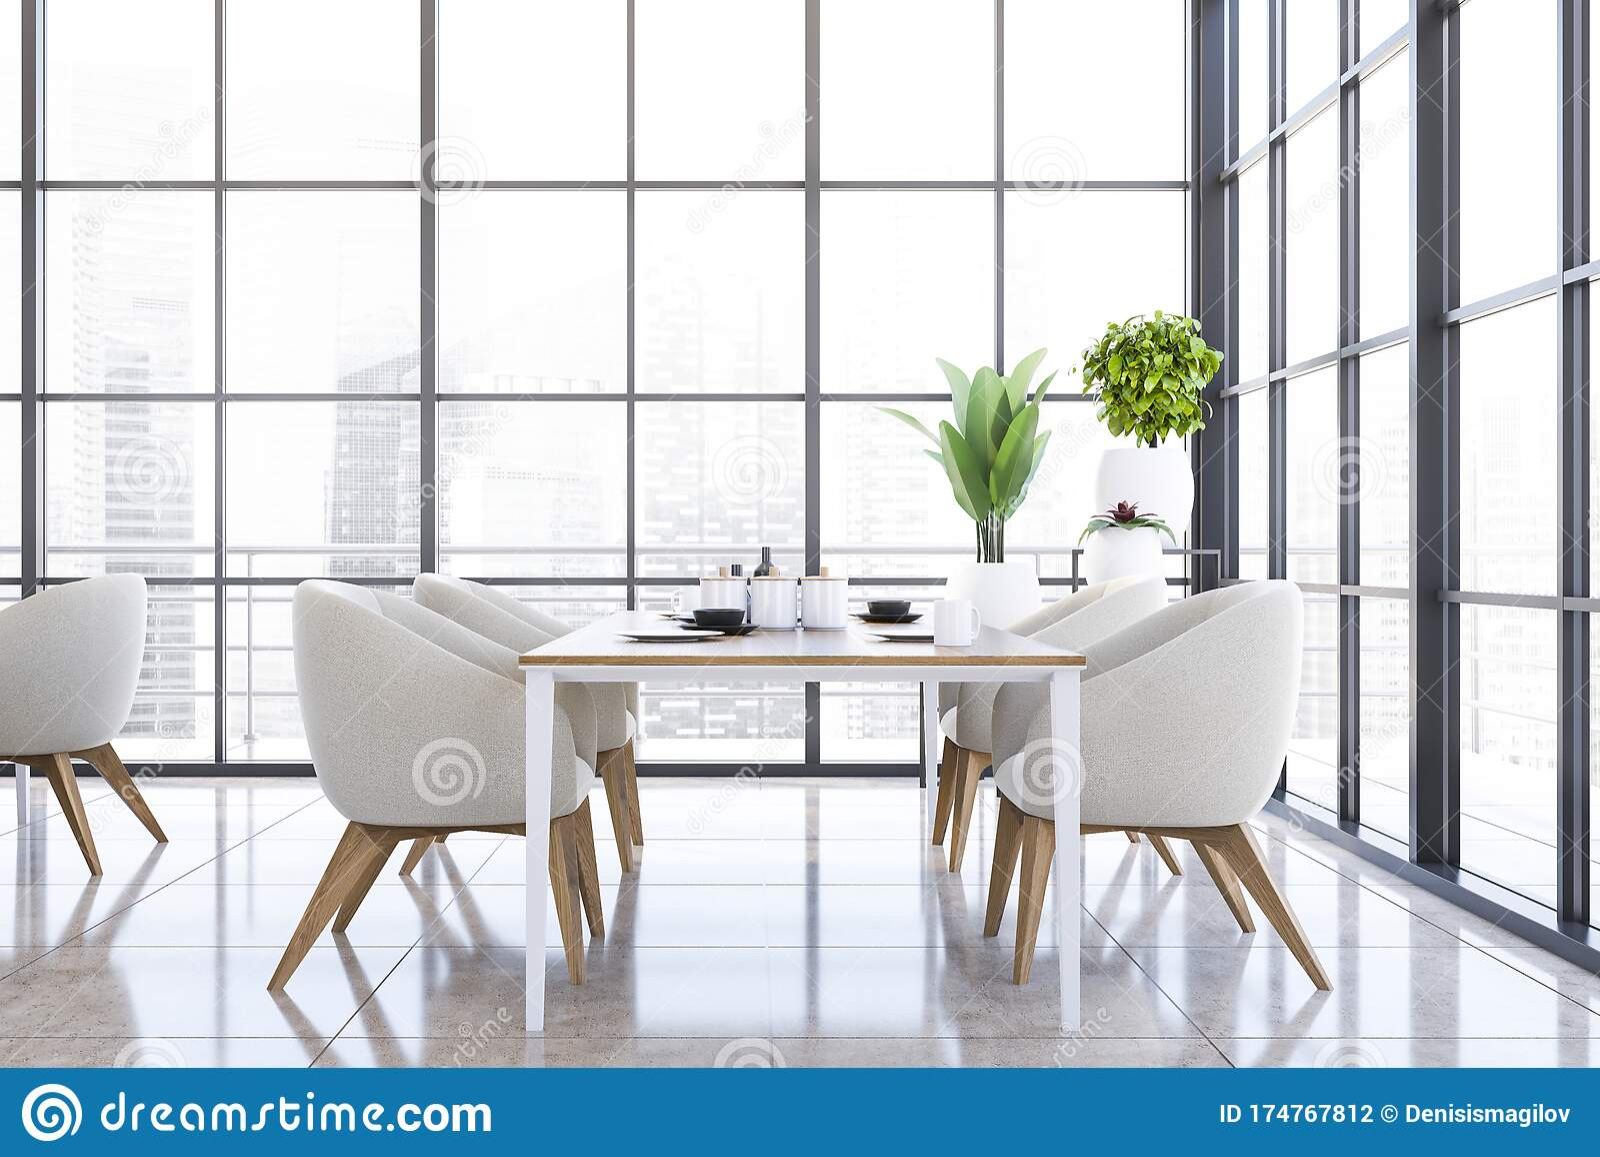 Panoramic White Armchairs Dining Room Interior Stock Illustration Illustration Of Lamp Luxury 174767812